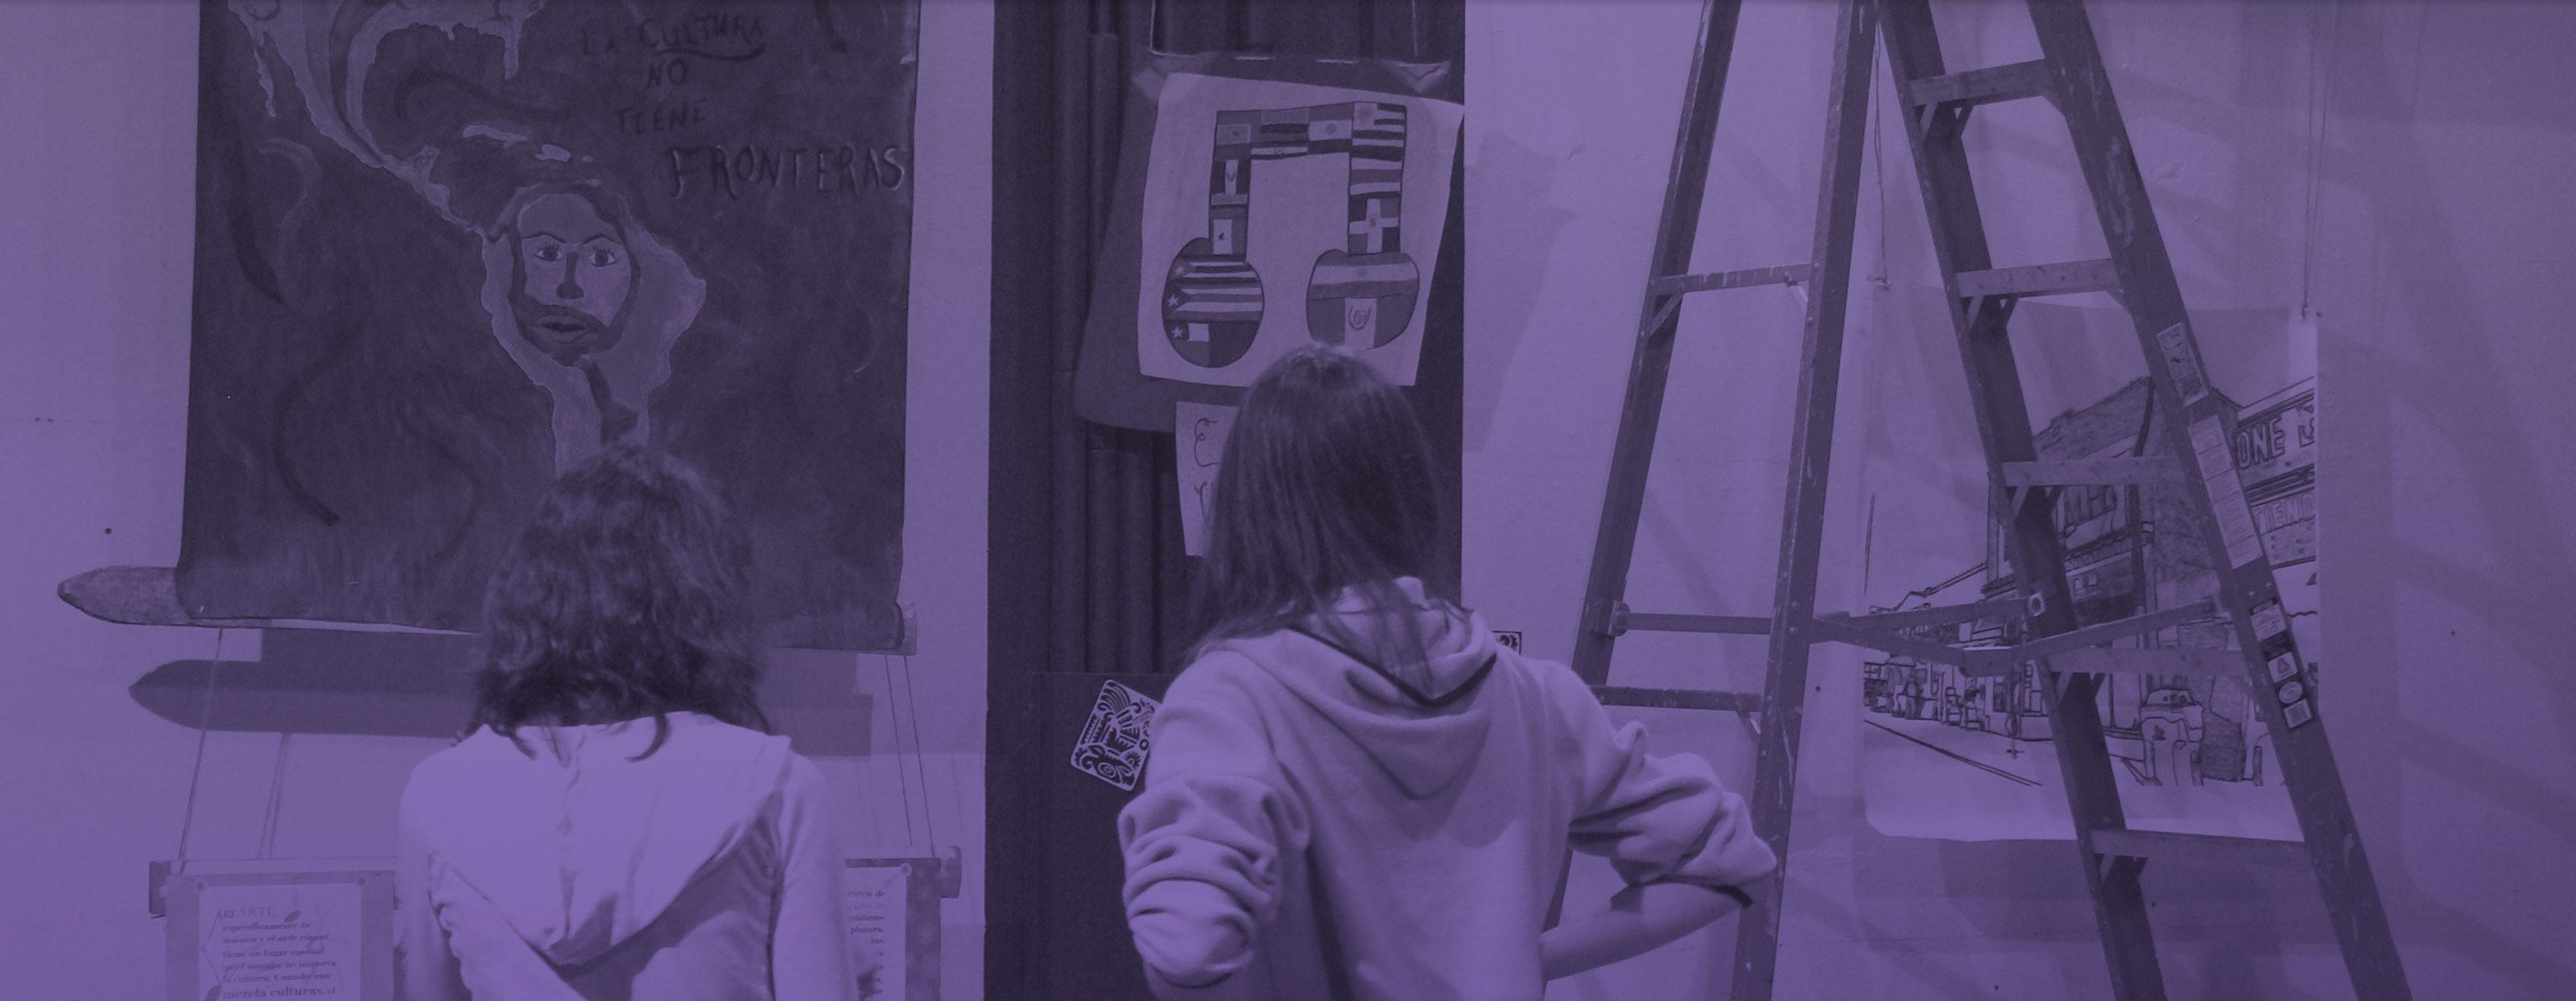 kid-curators-home-slide4